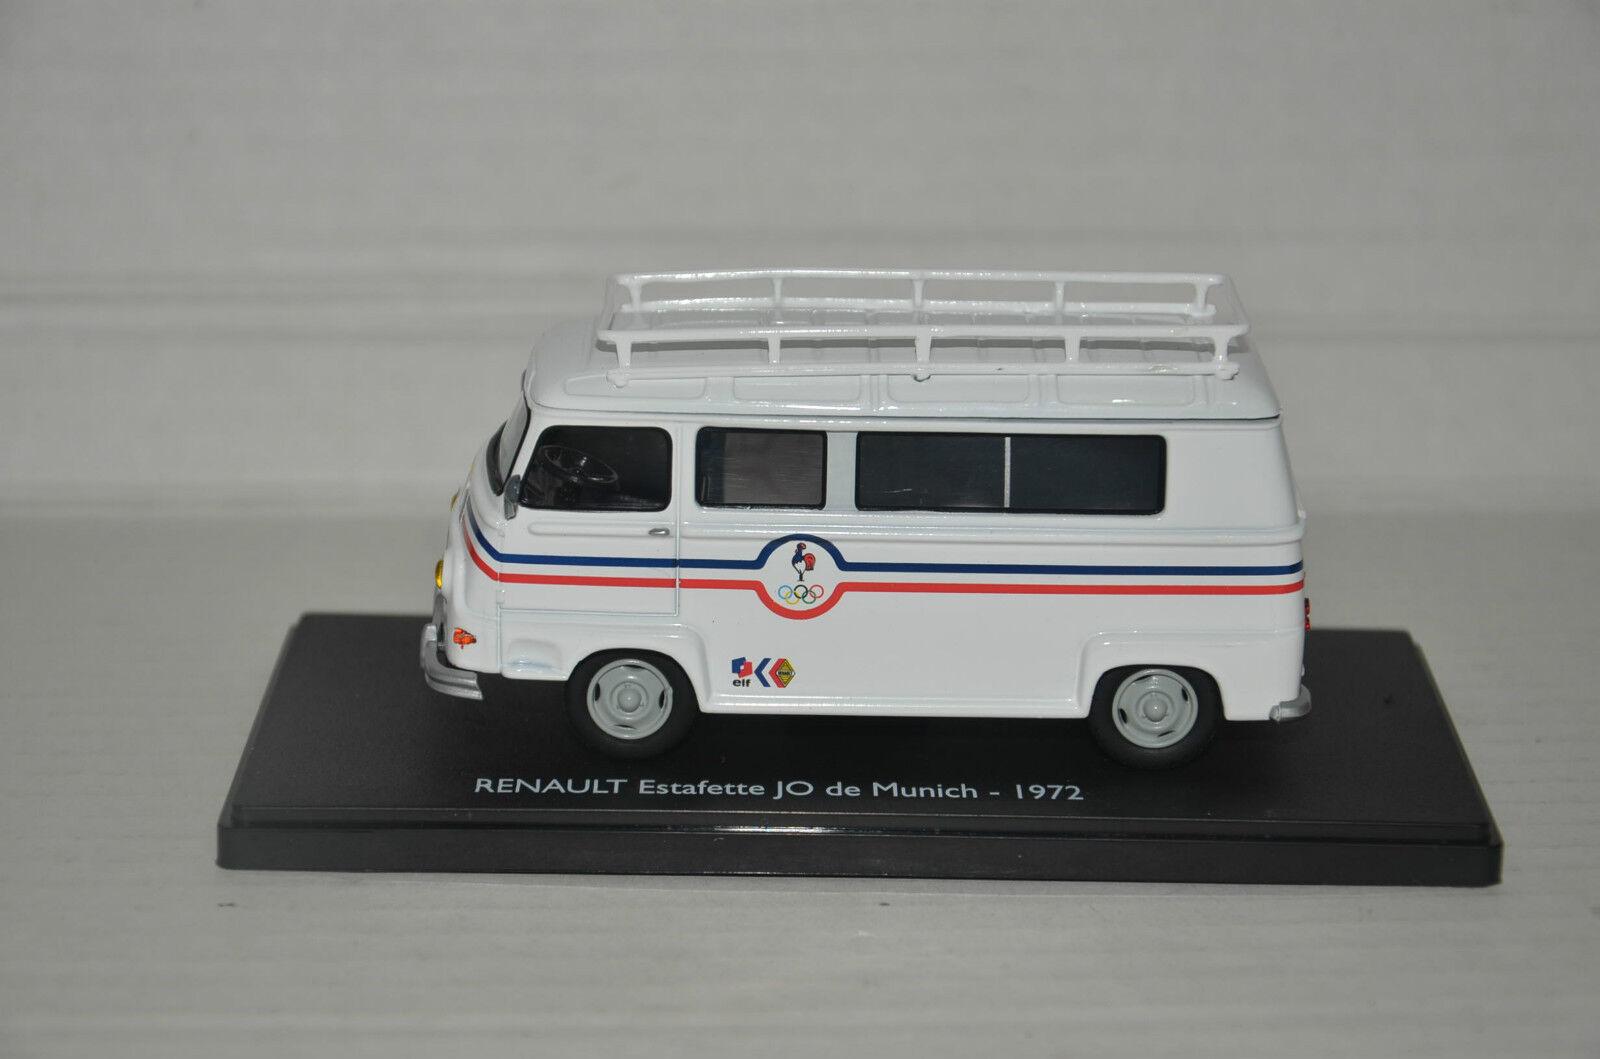 Renault Estafette Olimpic Game de Munich 1972 Eligor Eligor Eligor 1 43 Bad Days Of Israel 95eaa9